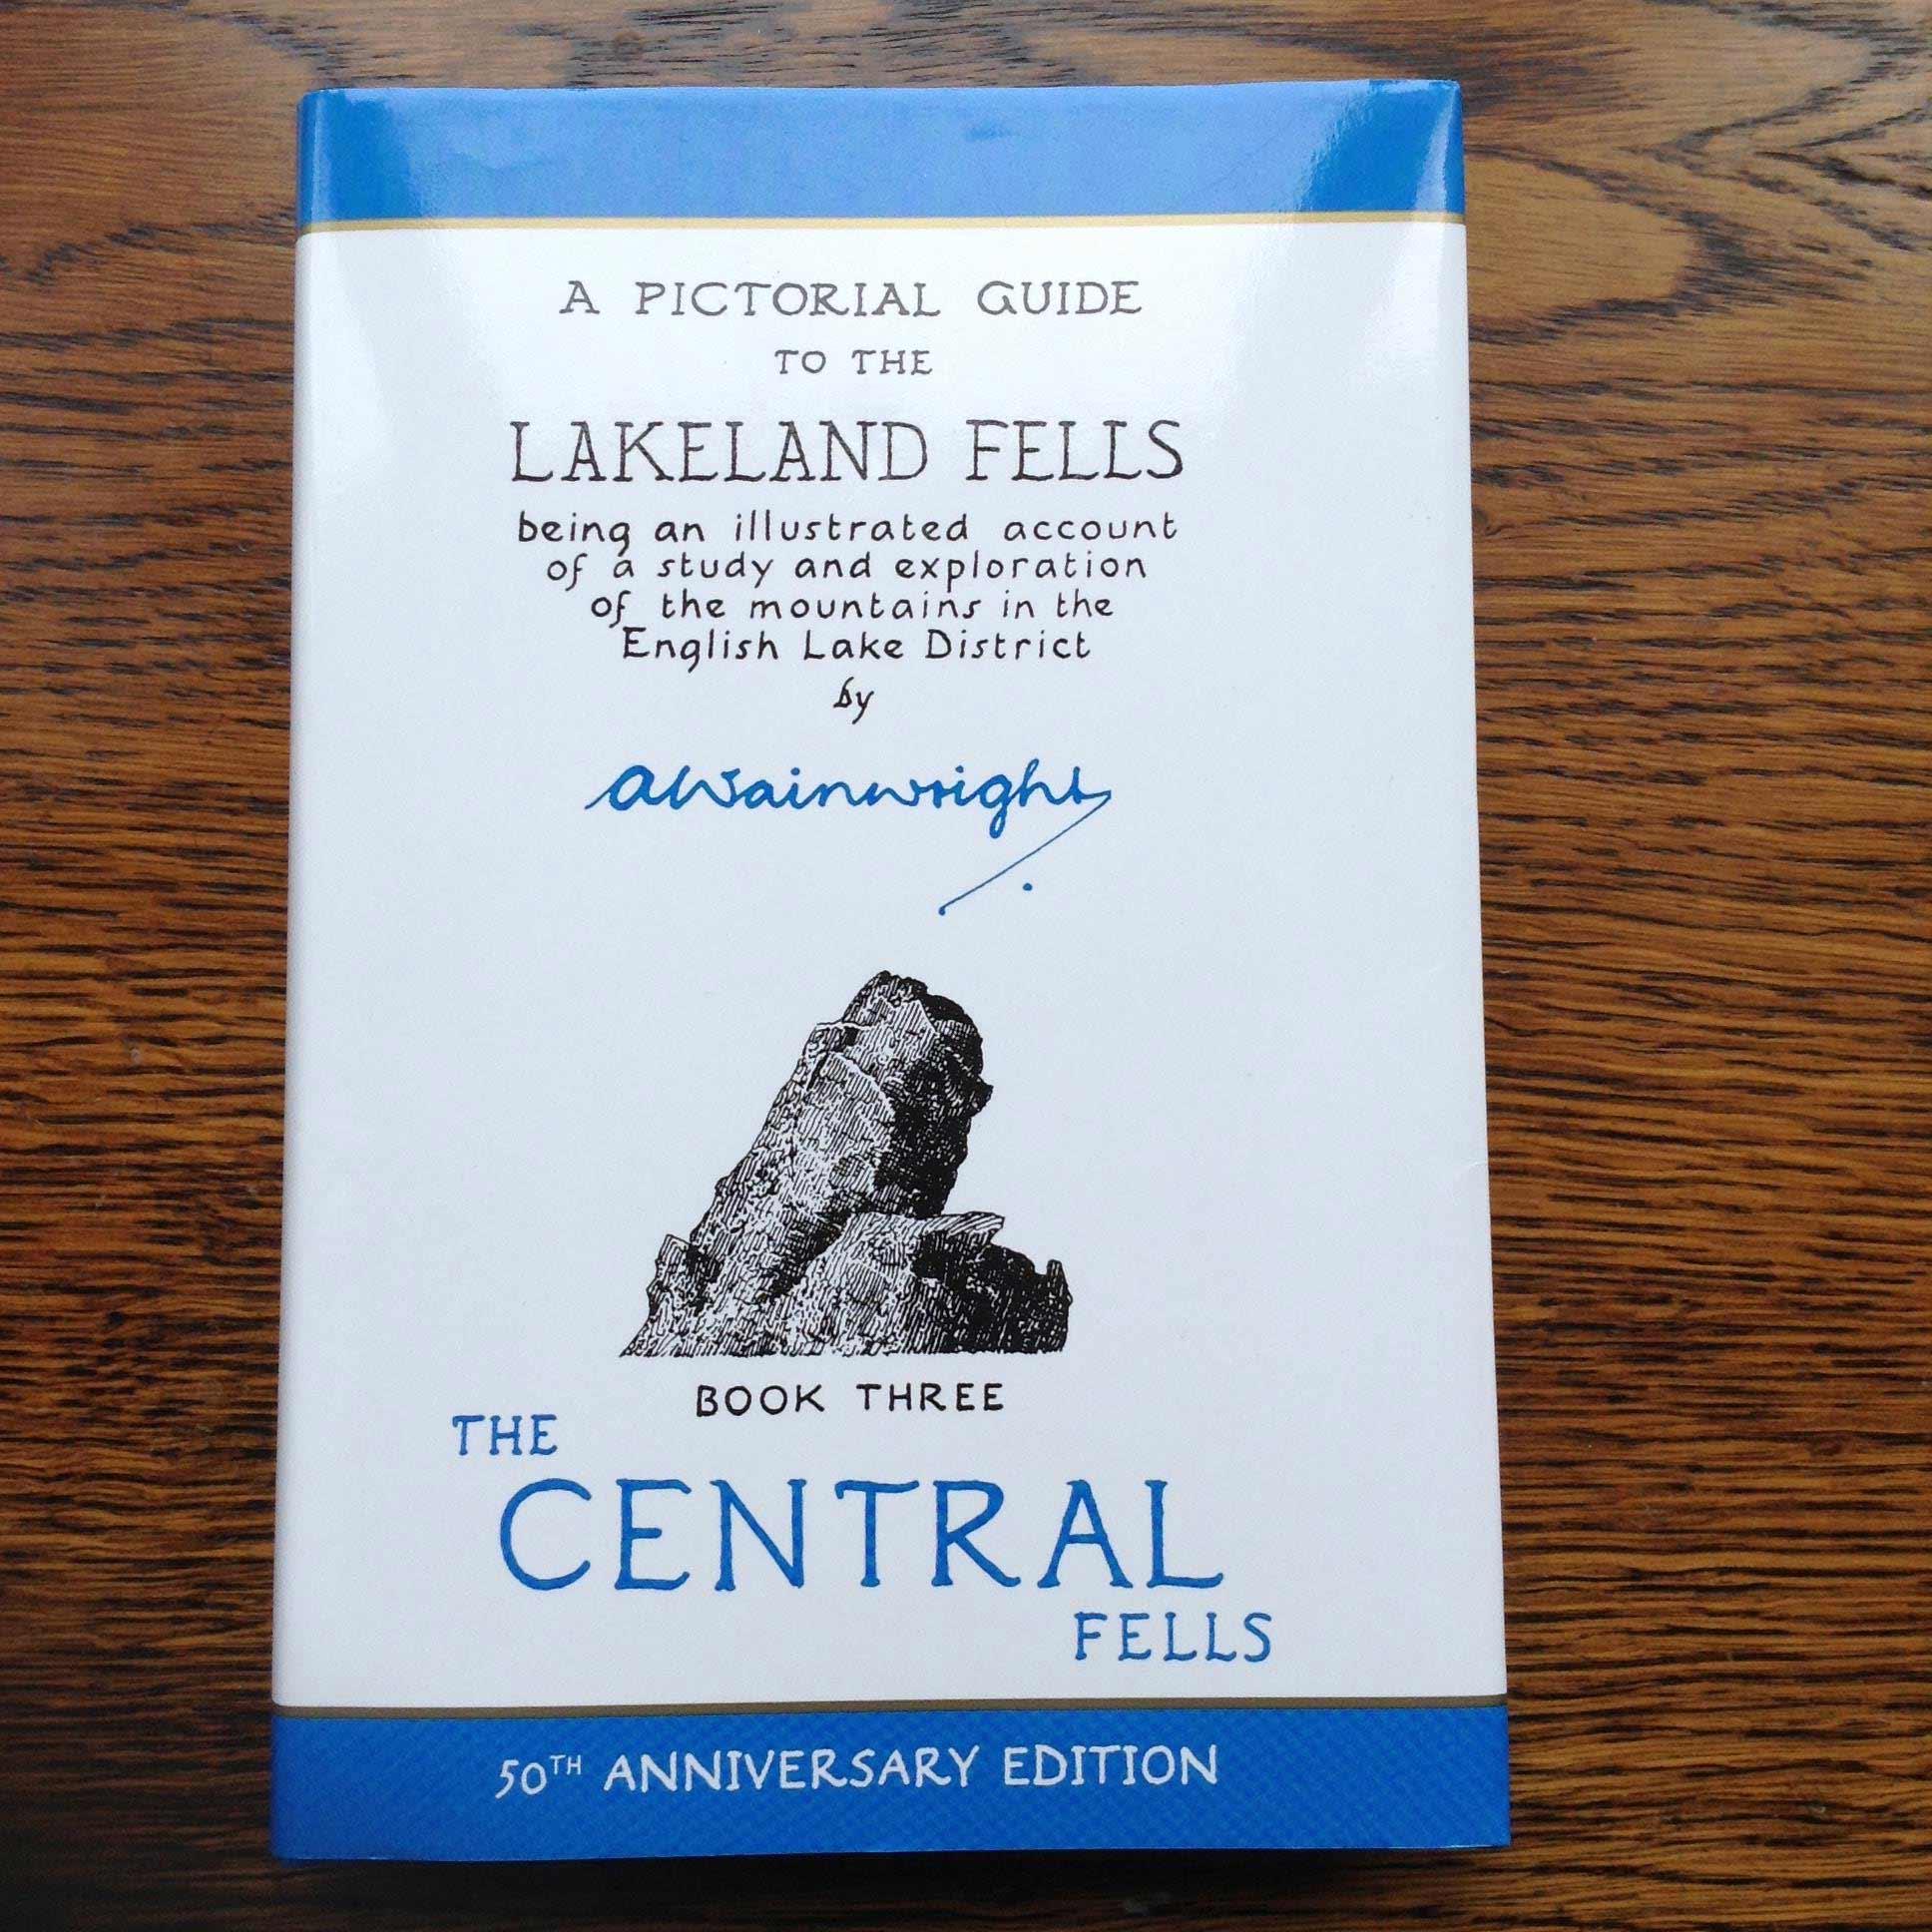 The Lakeland Fells book